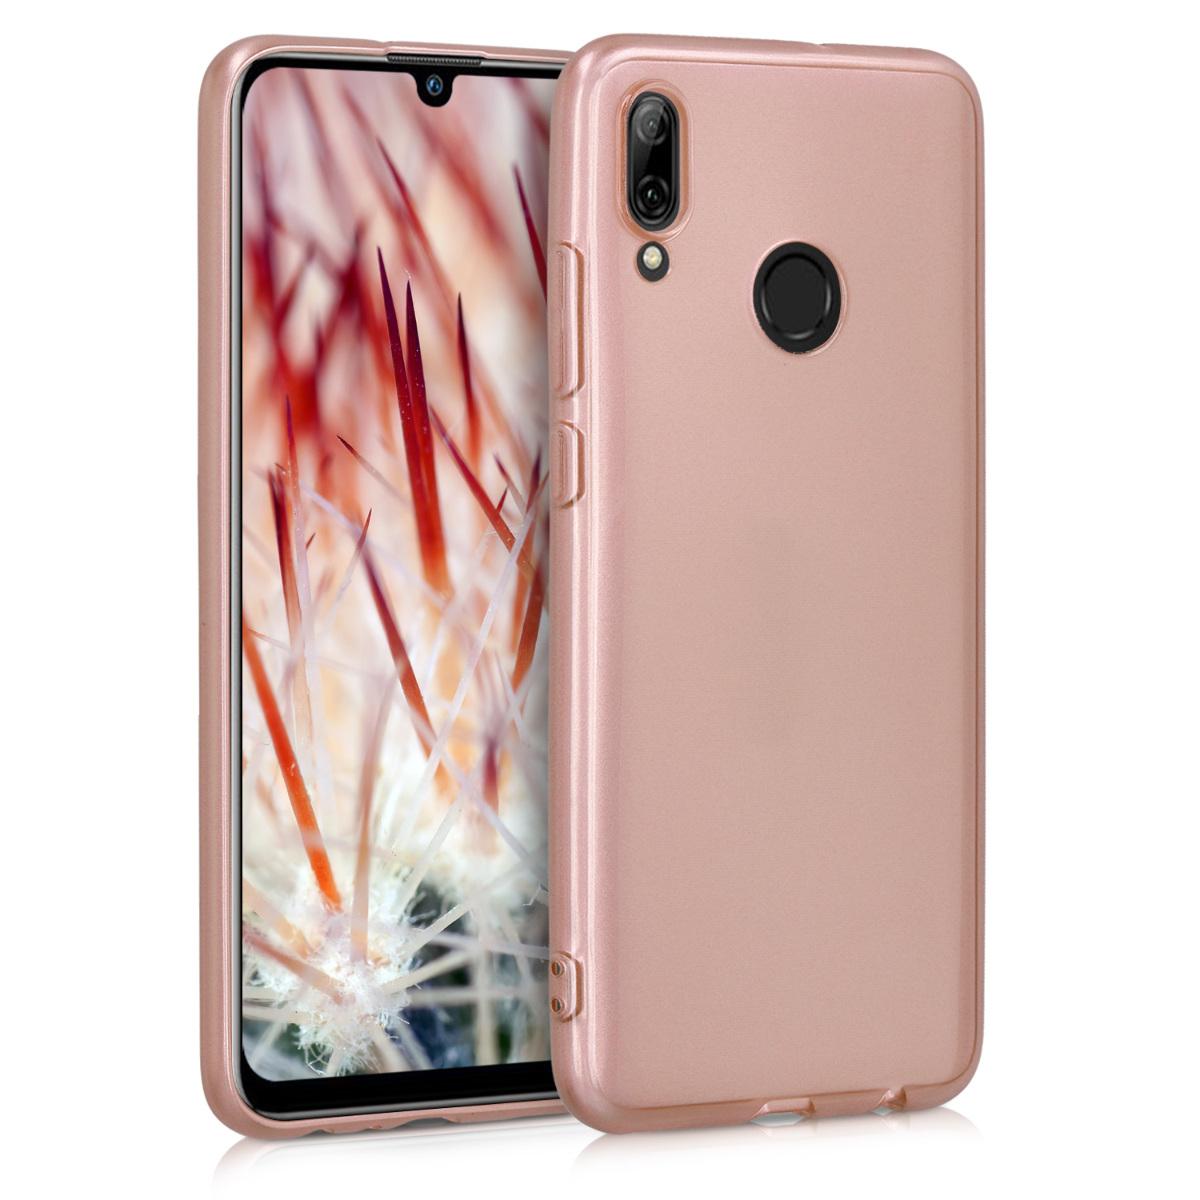 KW Θήκη Σιλικόνης Huawei P Smart (2019) - Soft Flexible Shock Absorbent  - Rose Gold High Gloss (47386.93)